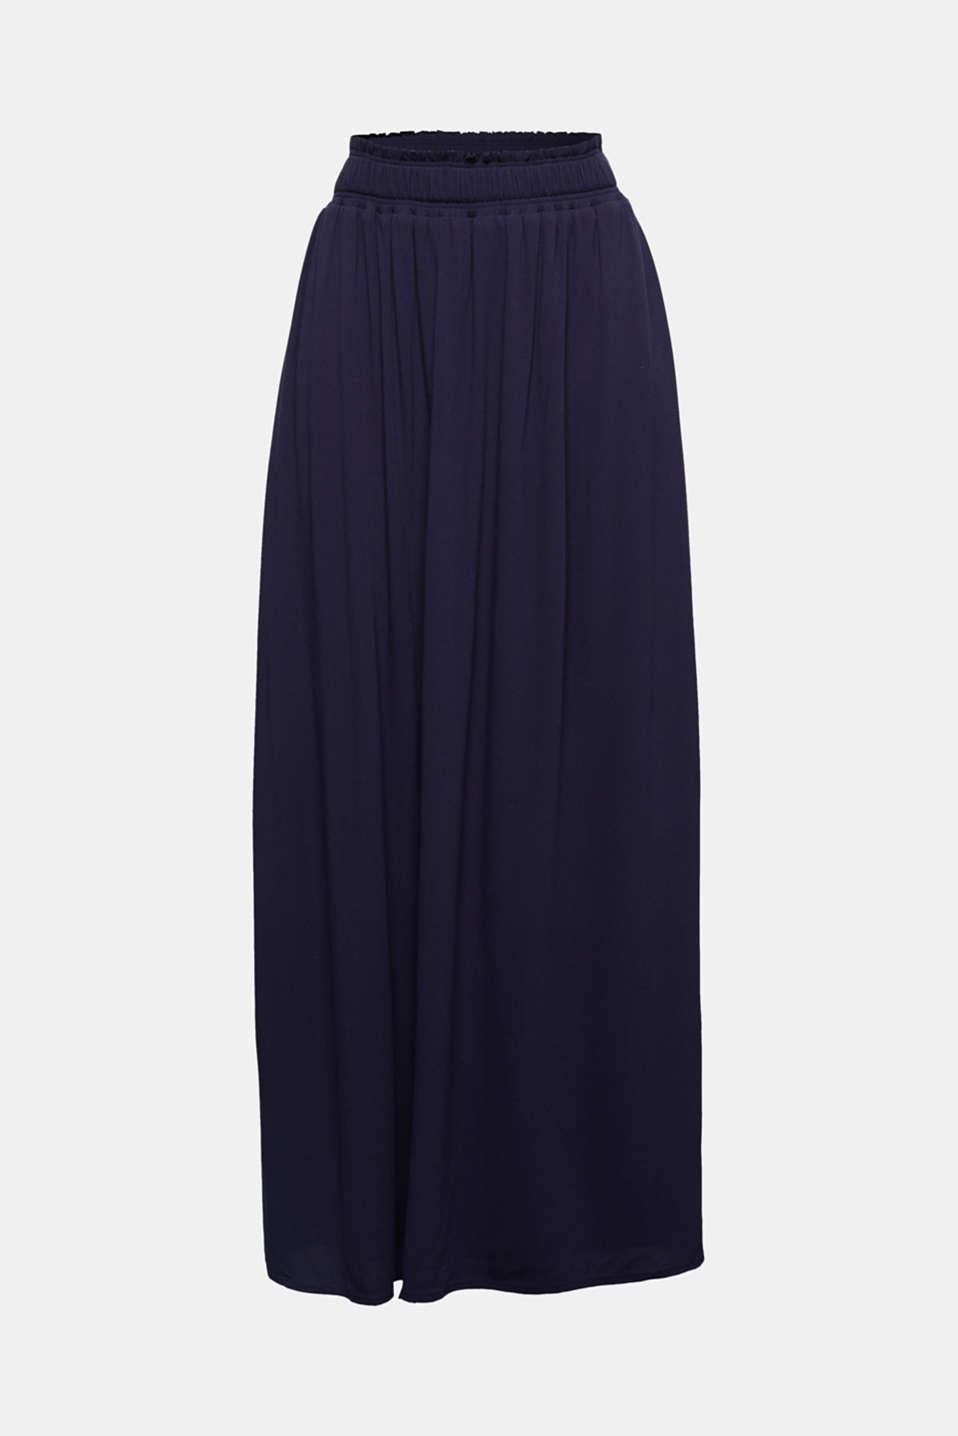 Maxi skirt in flowing crêpe, NAVY, detail image number 4